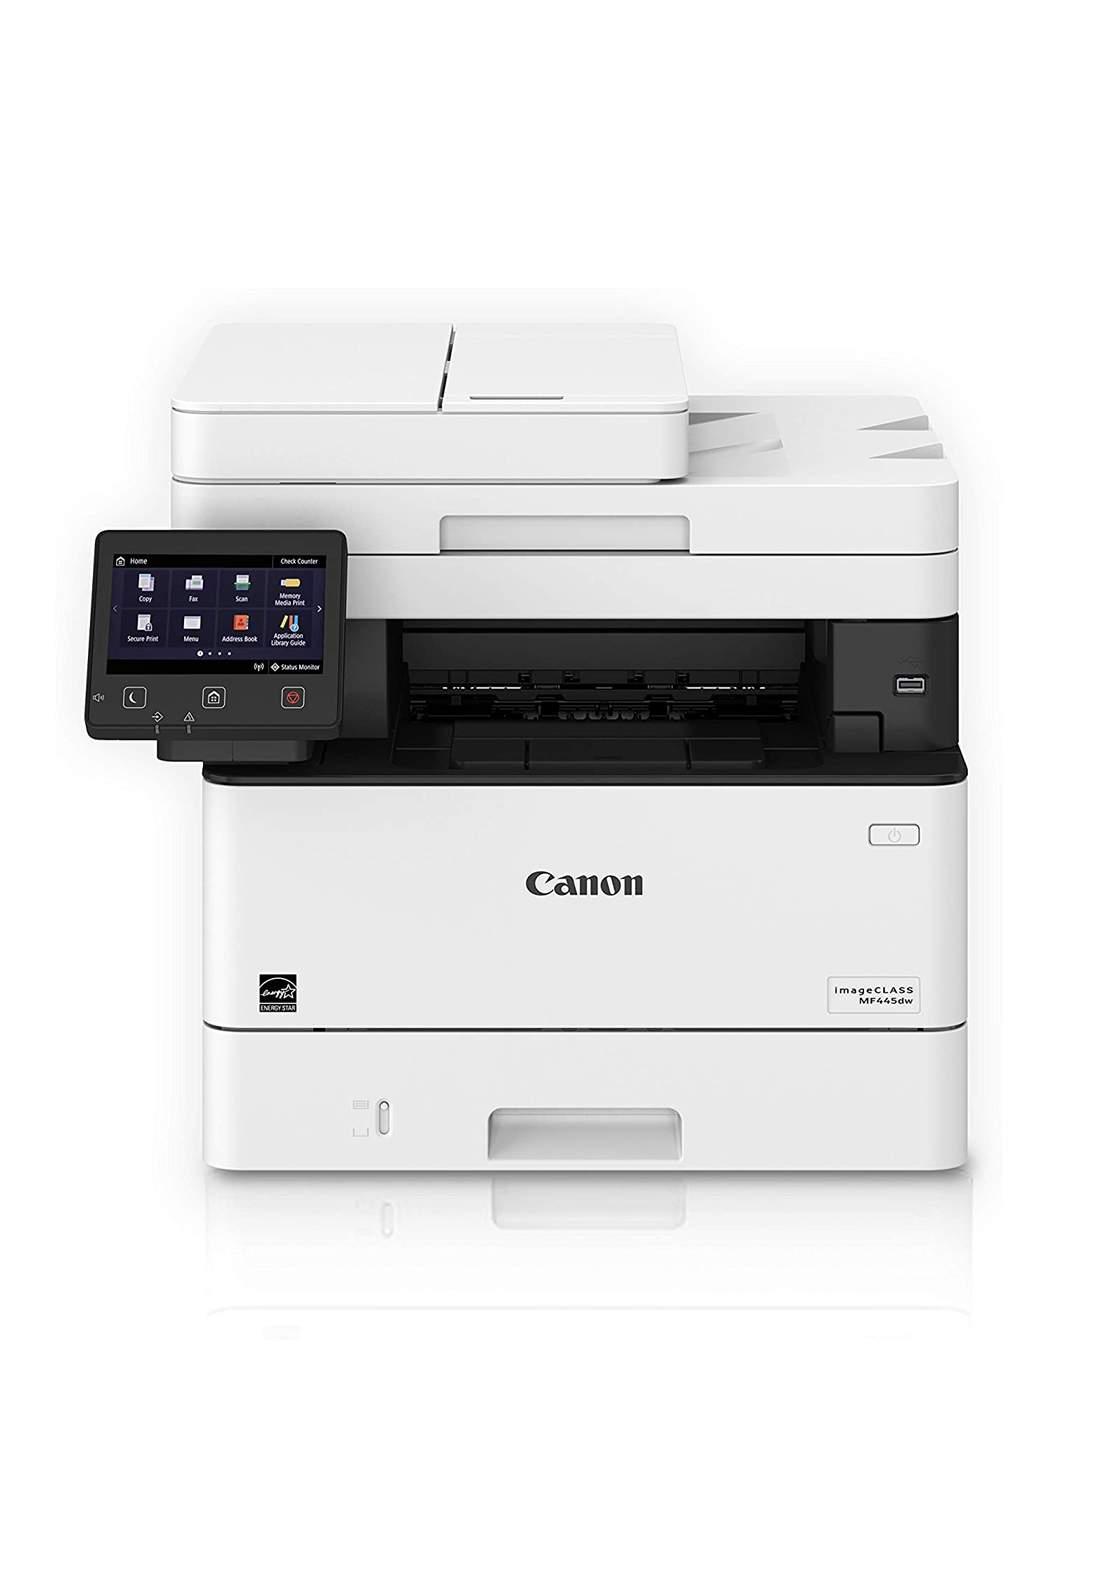 Canon imageCLASS MF445dw Monochrome Laser Printer - White طابعة